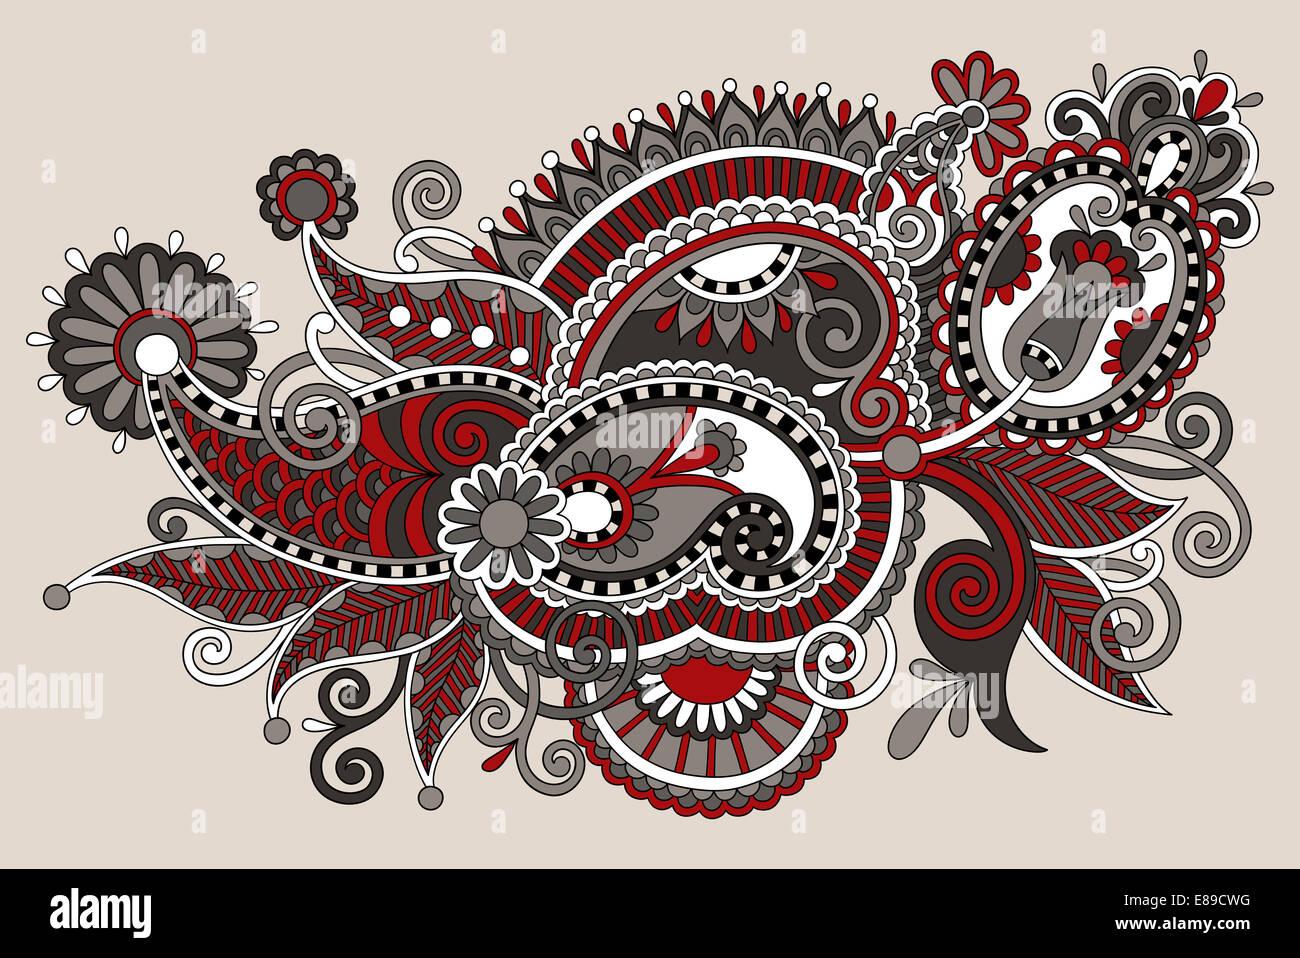 Line Art Flower Design : Original digital draw line art ornate flower design ukrainian t